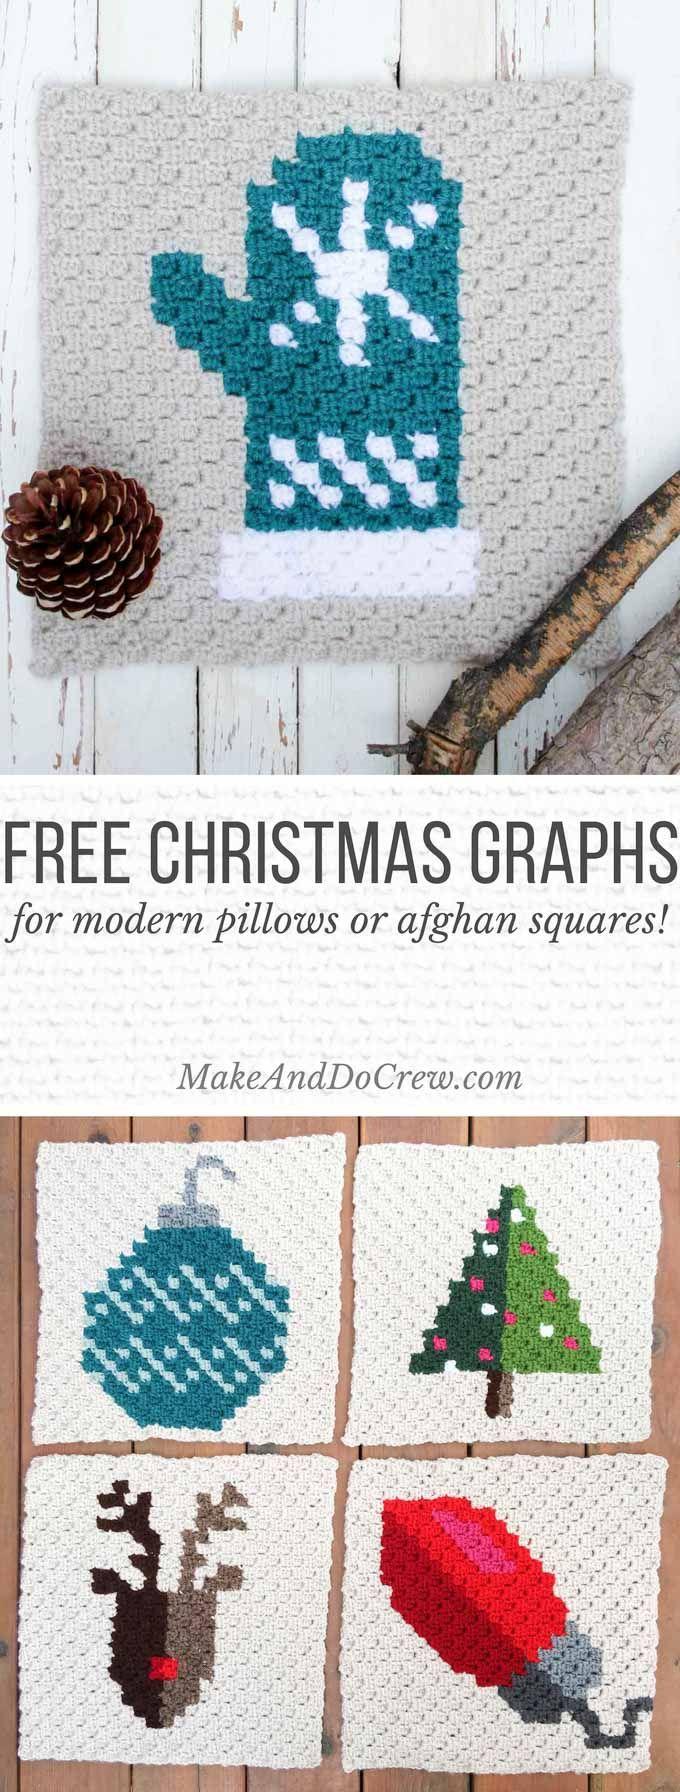 Mitten C2C Crochet Afghan Graph - Free Pattern | Tejido, Navidad y ...